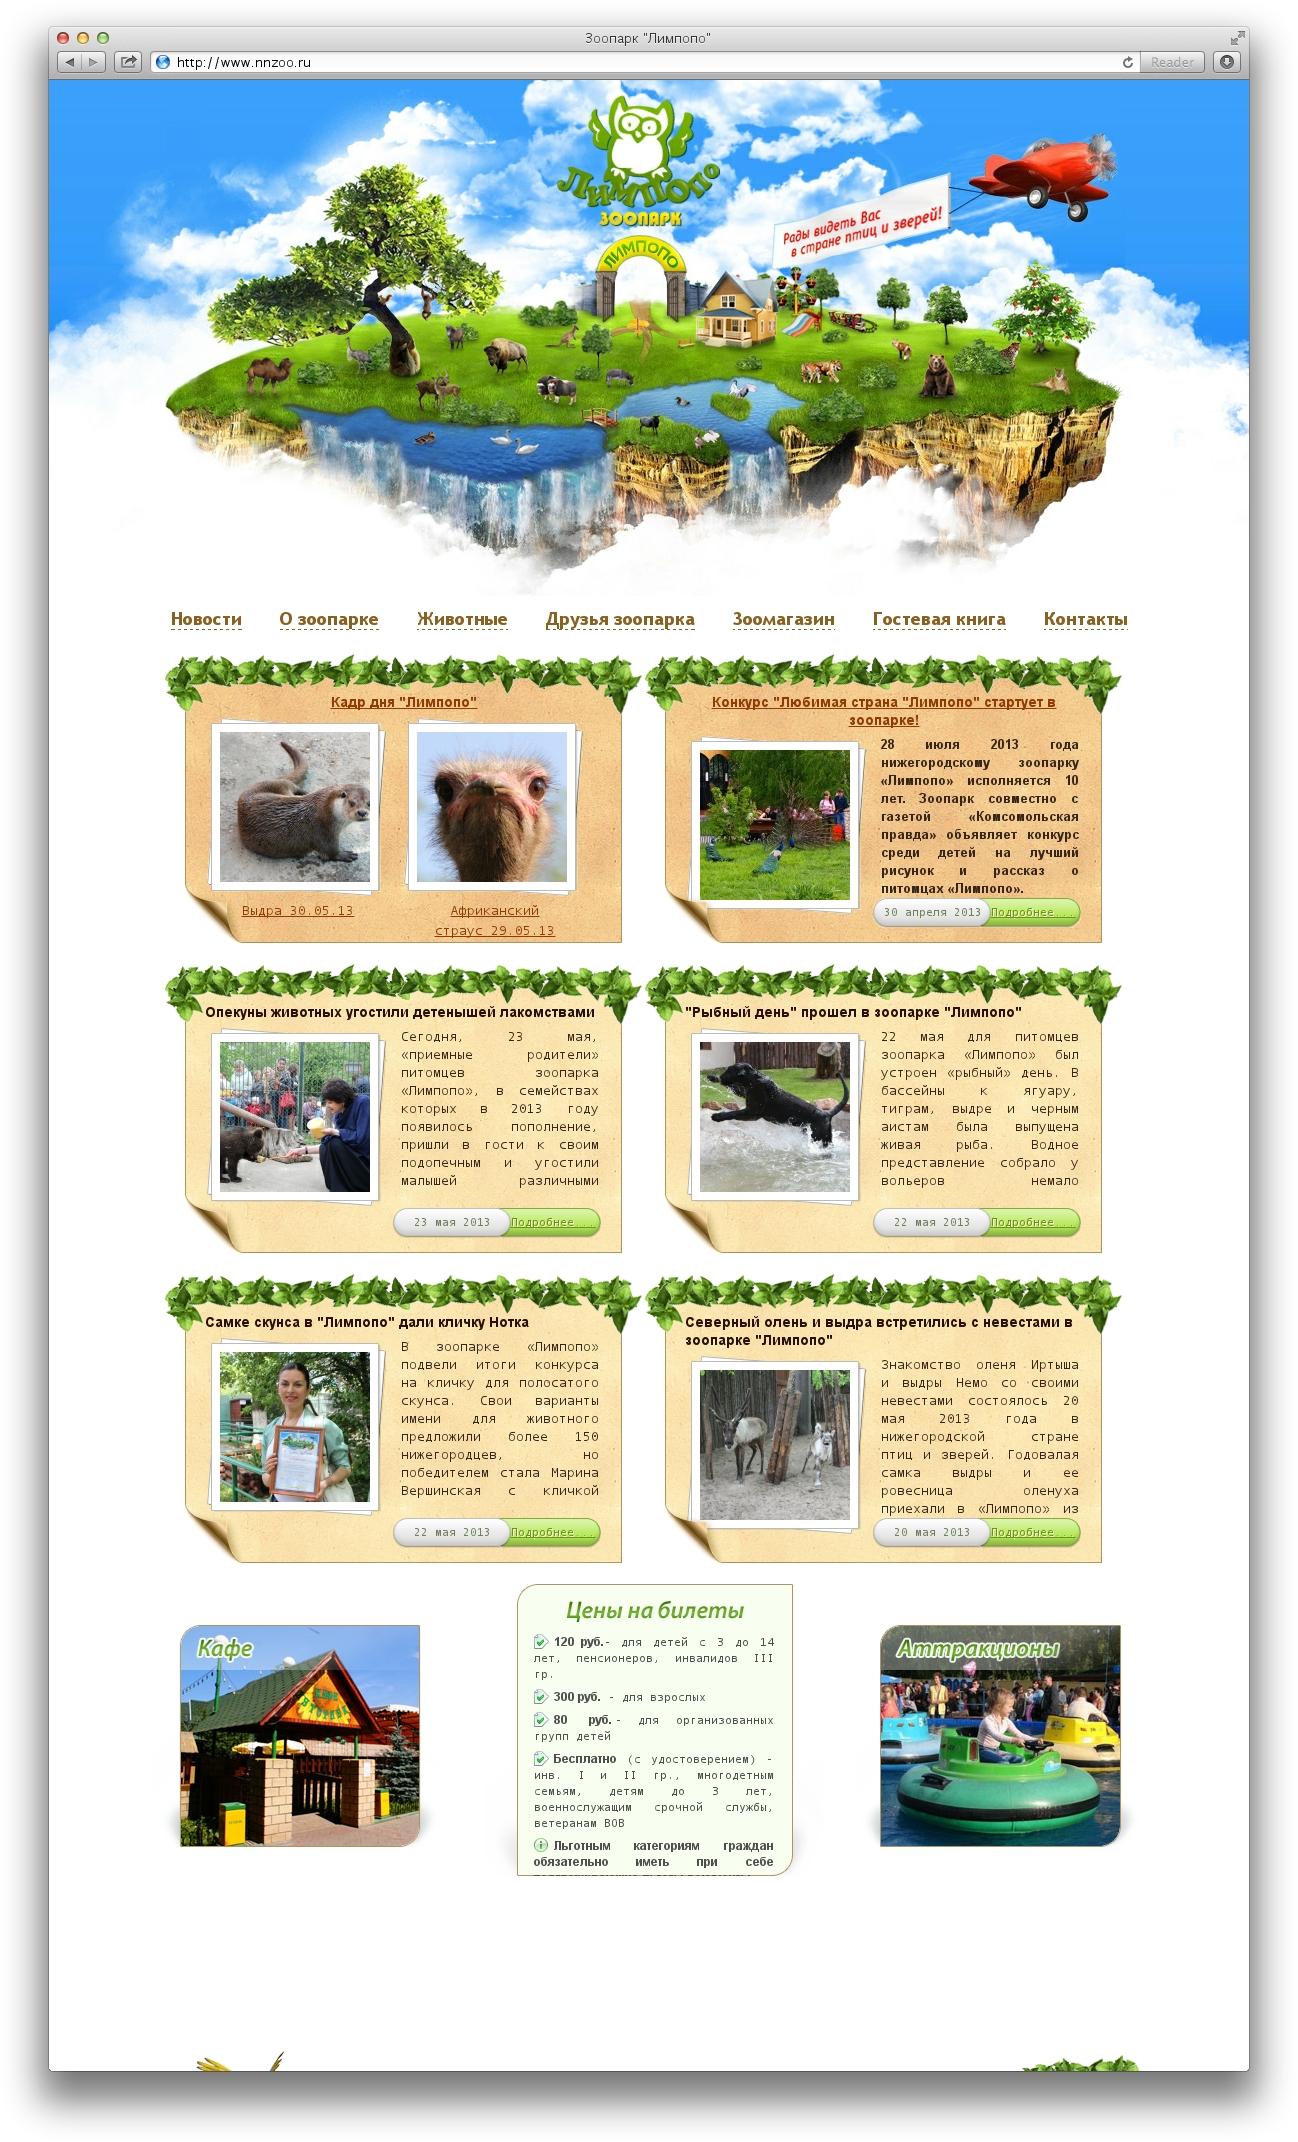 Зоопарк лимпопо схема